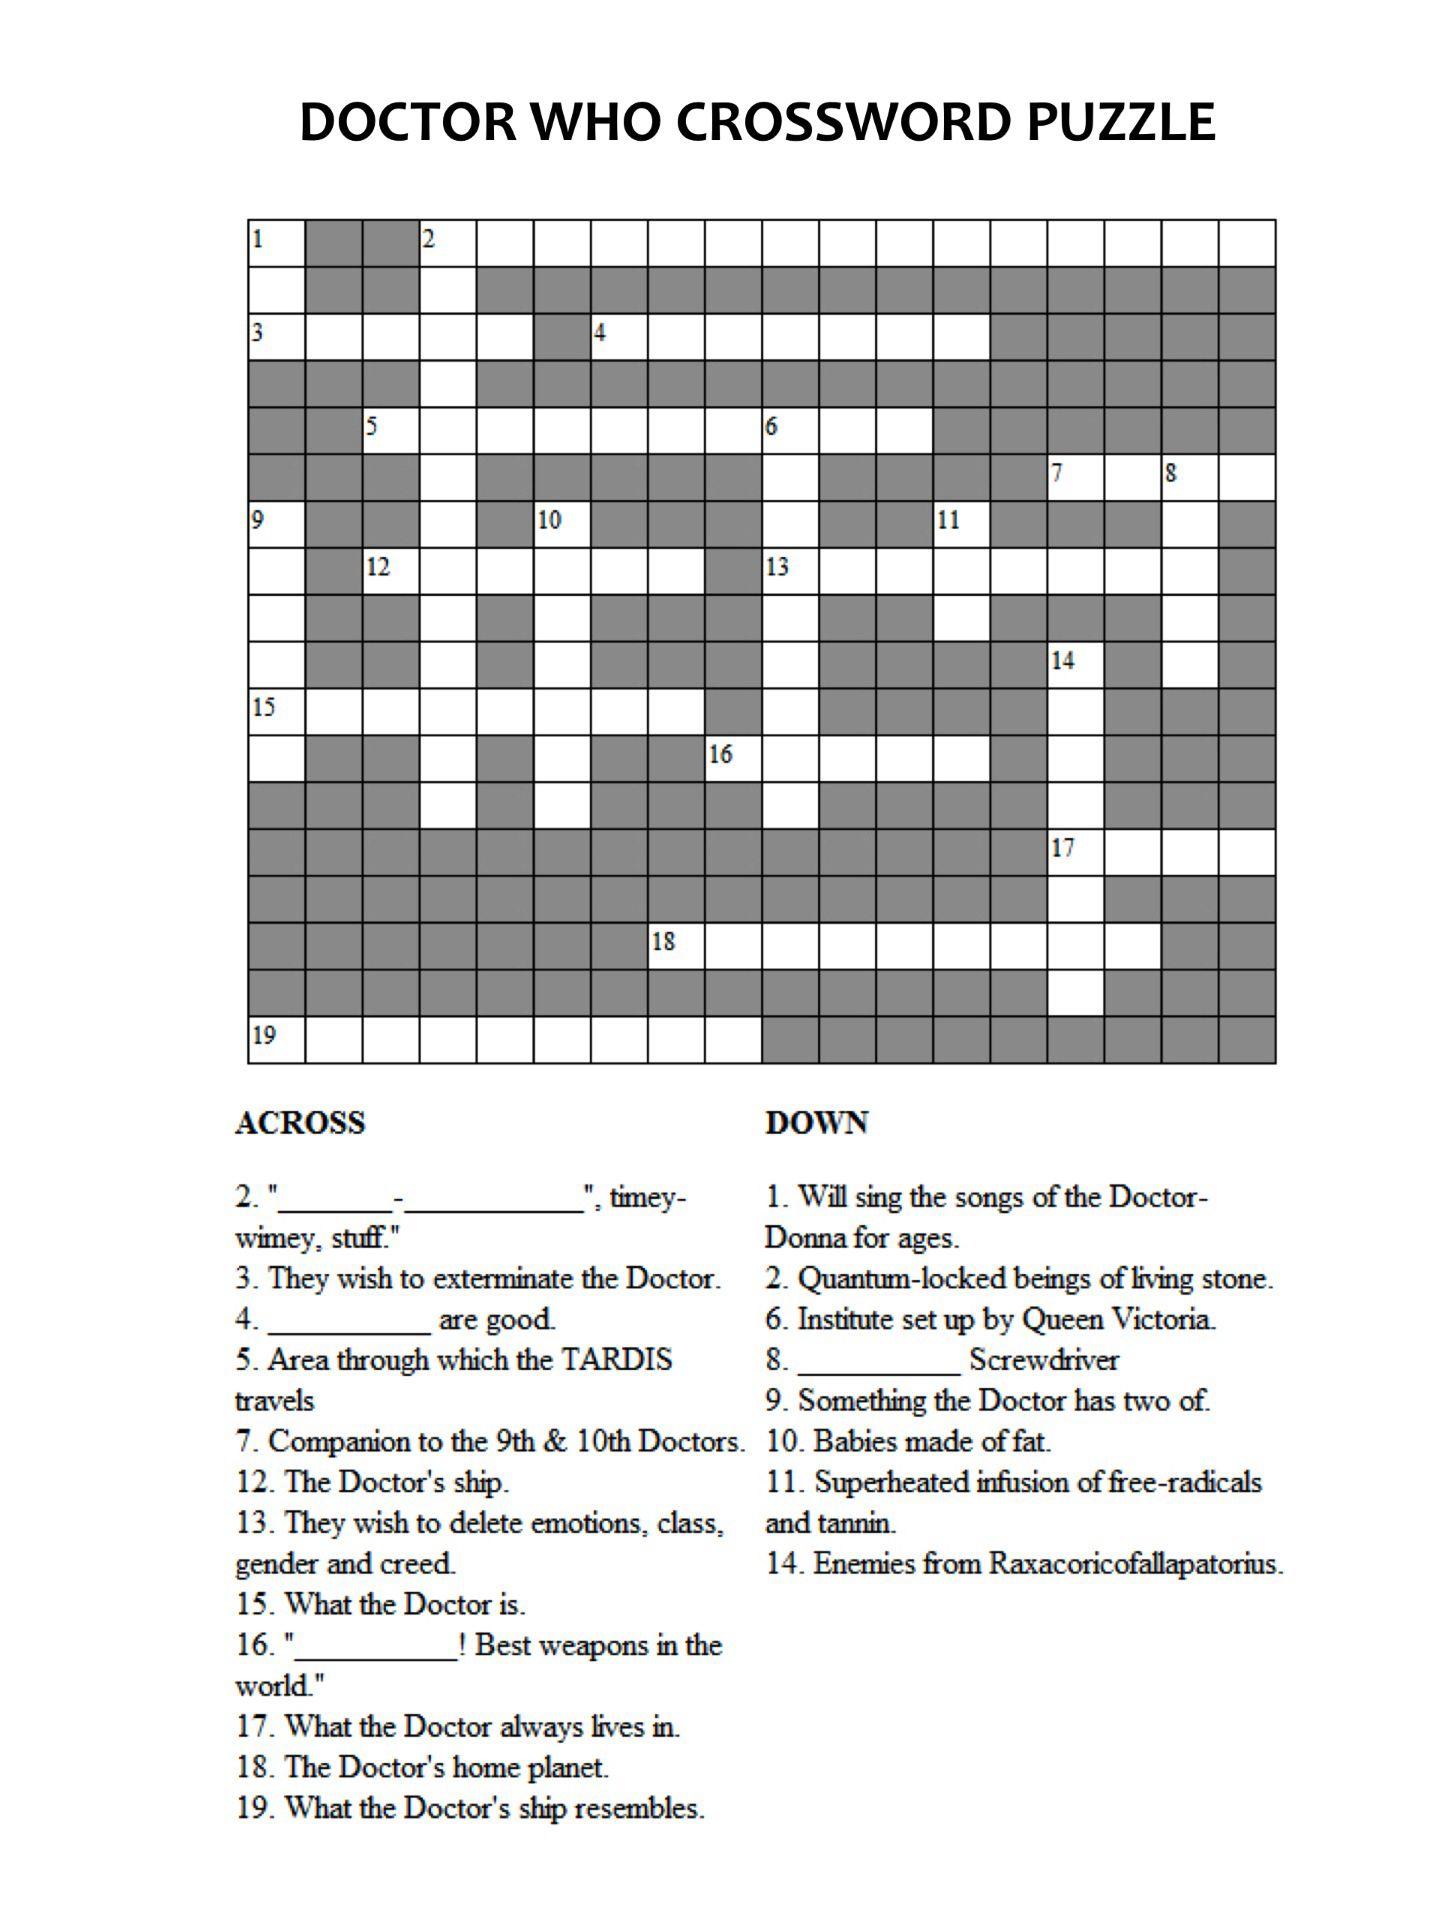 Doctor Who Crossword Puzzle. Doctor Who crossword puzzle   Persephone Magazine   Geekery